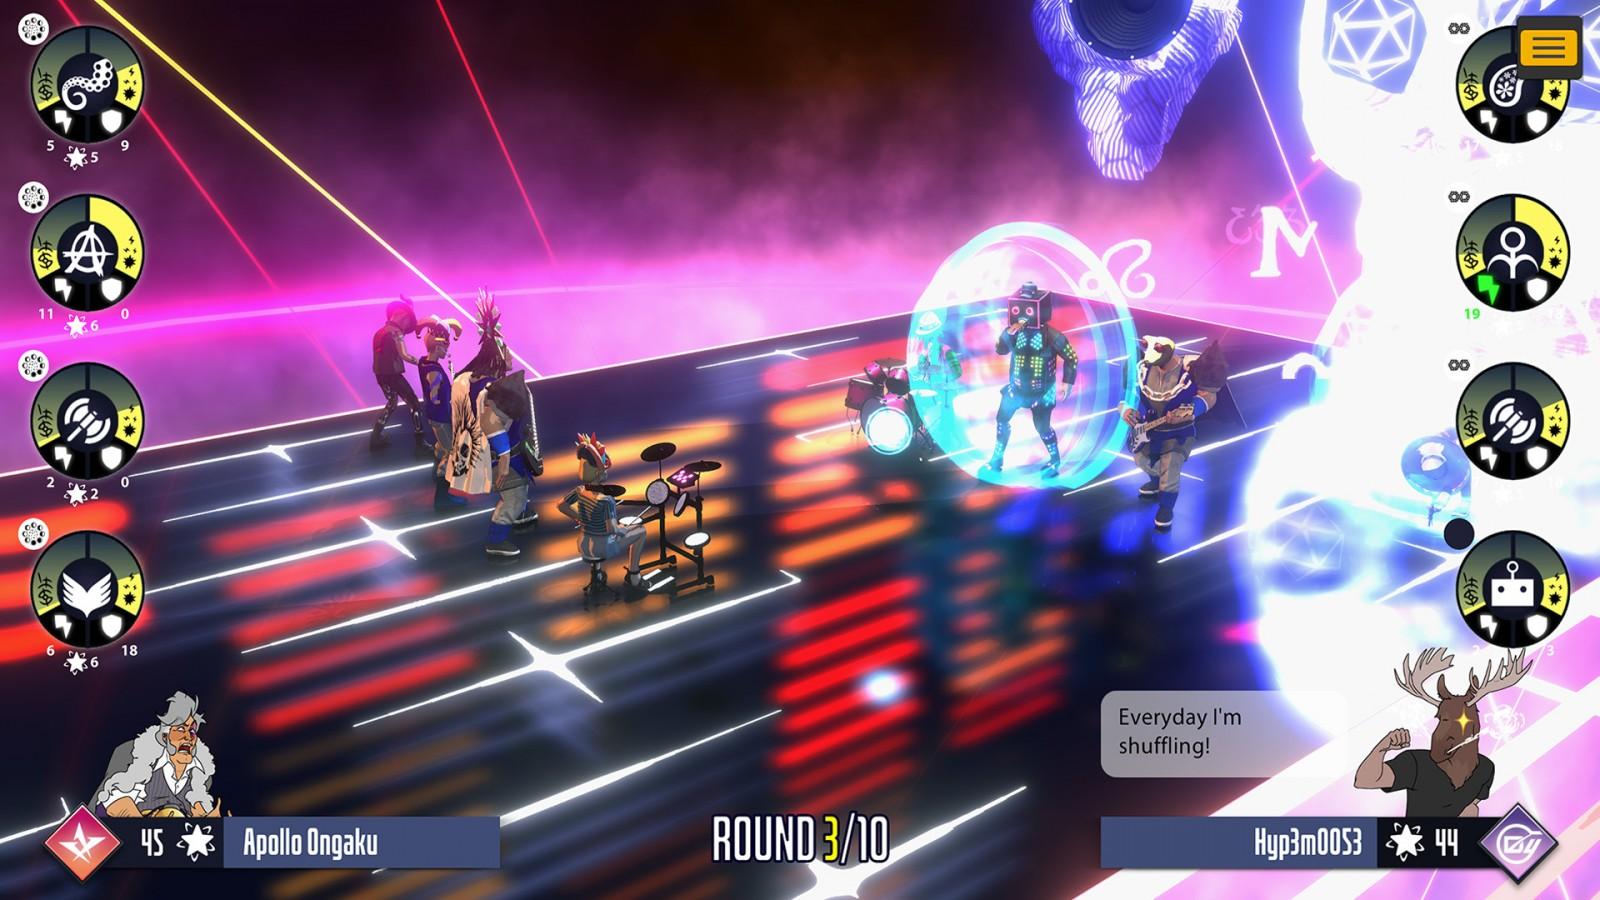 AudioClash: Battle of the Bands tendrá Acceso Anticipado en Steam 2